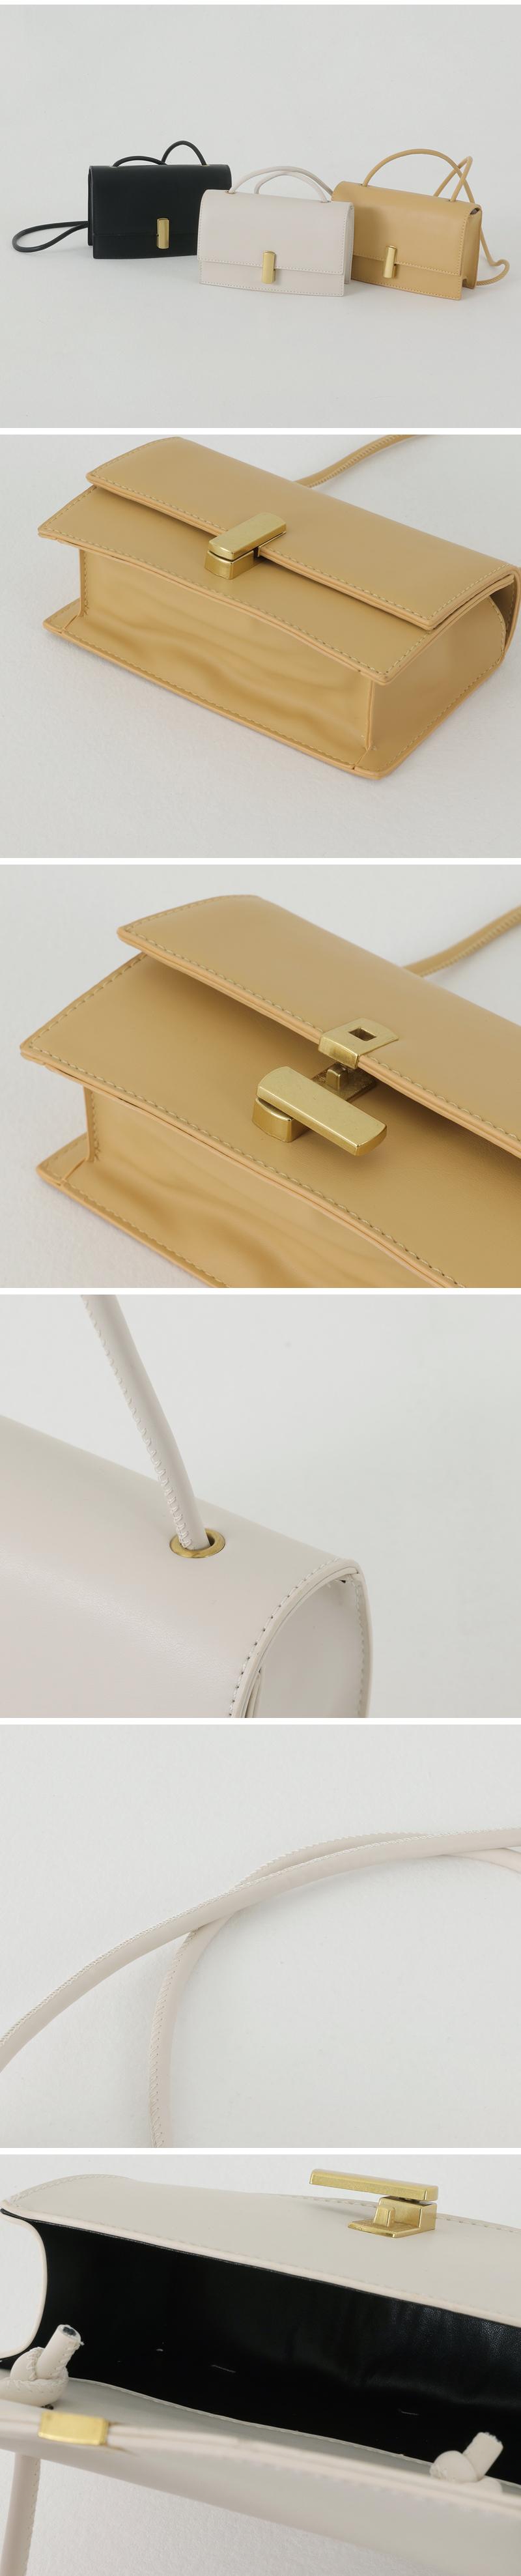 Square Buckle Simple Cross Bag